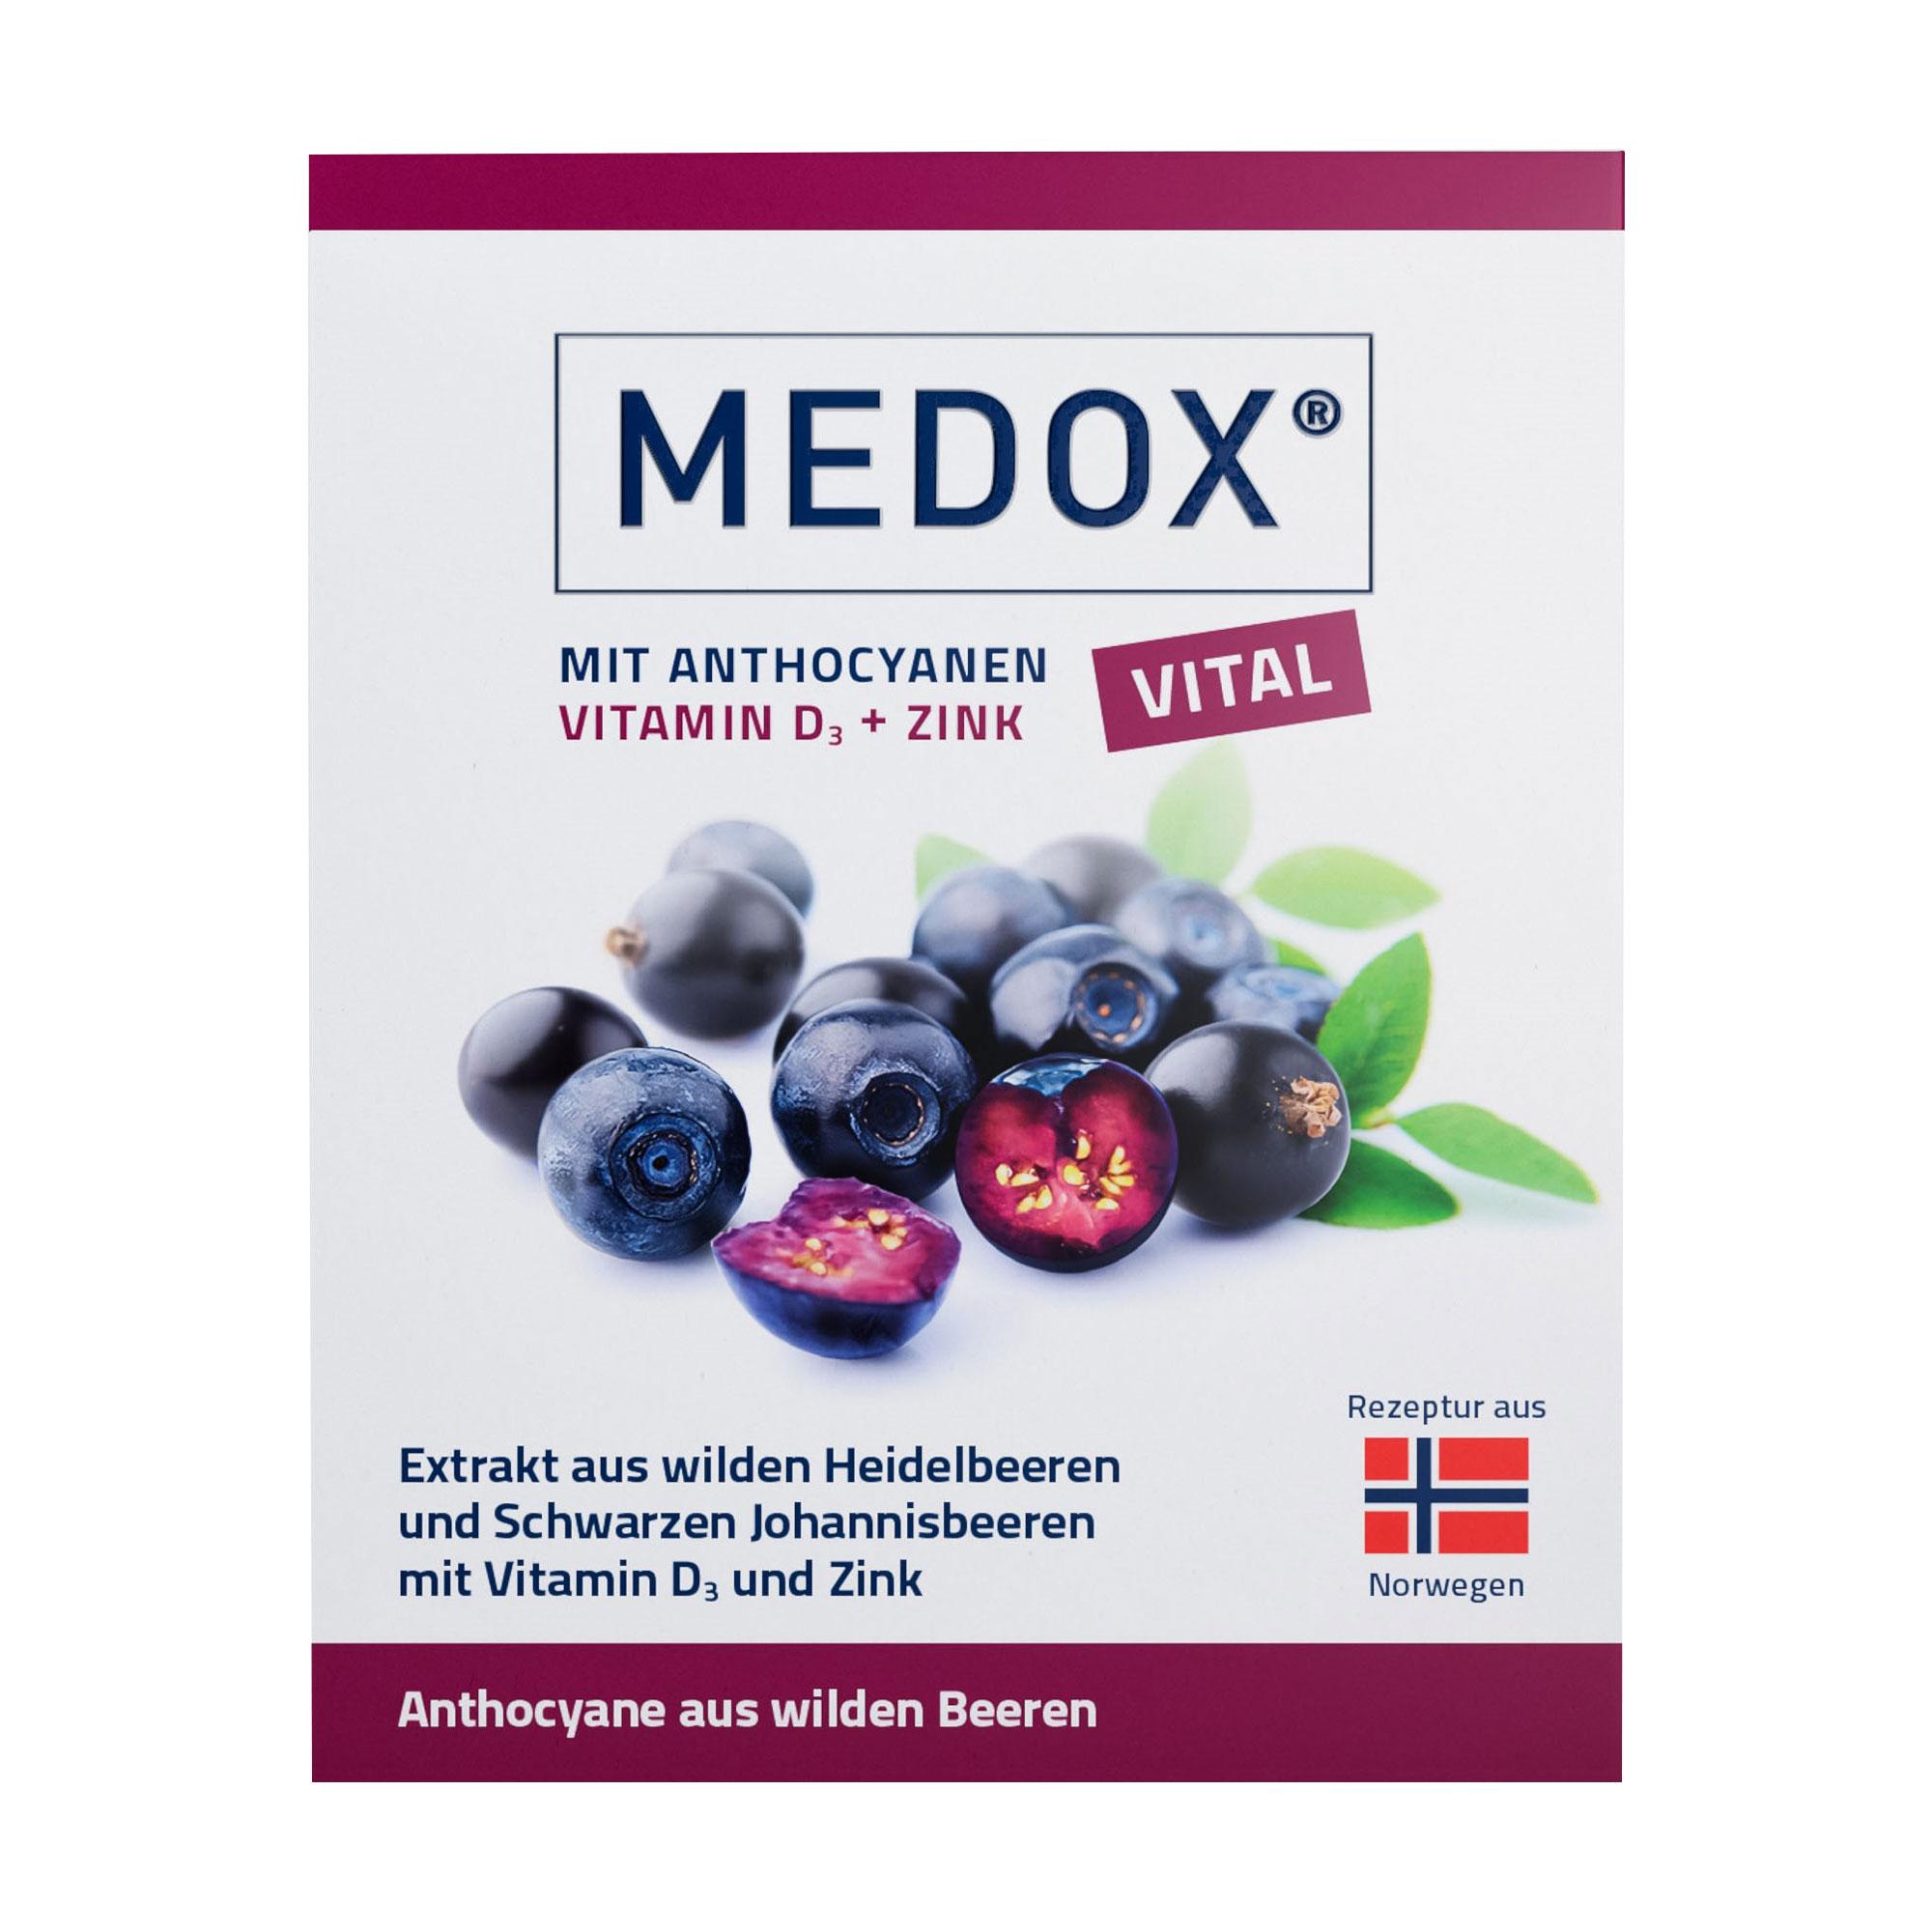 Medox Vital Kapseln